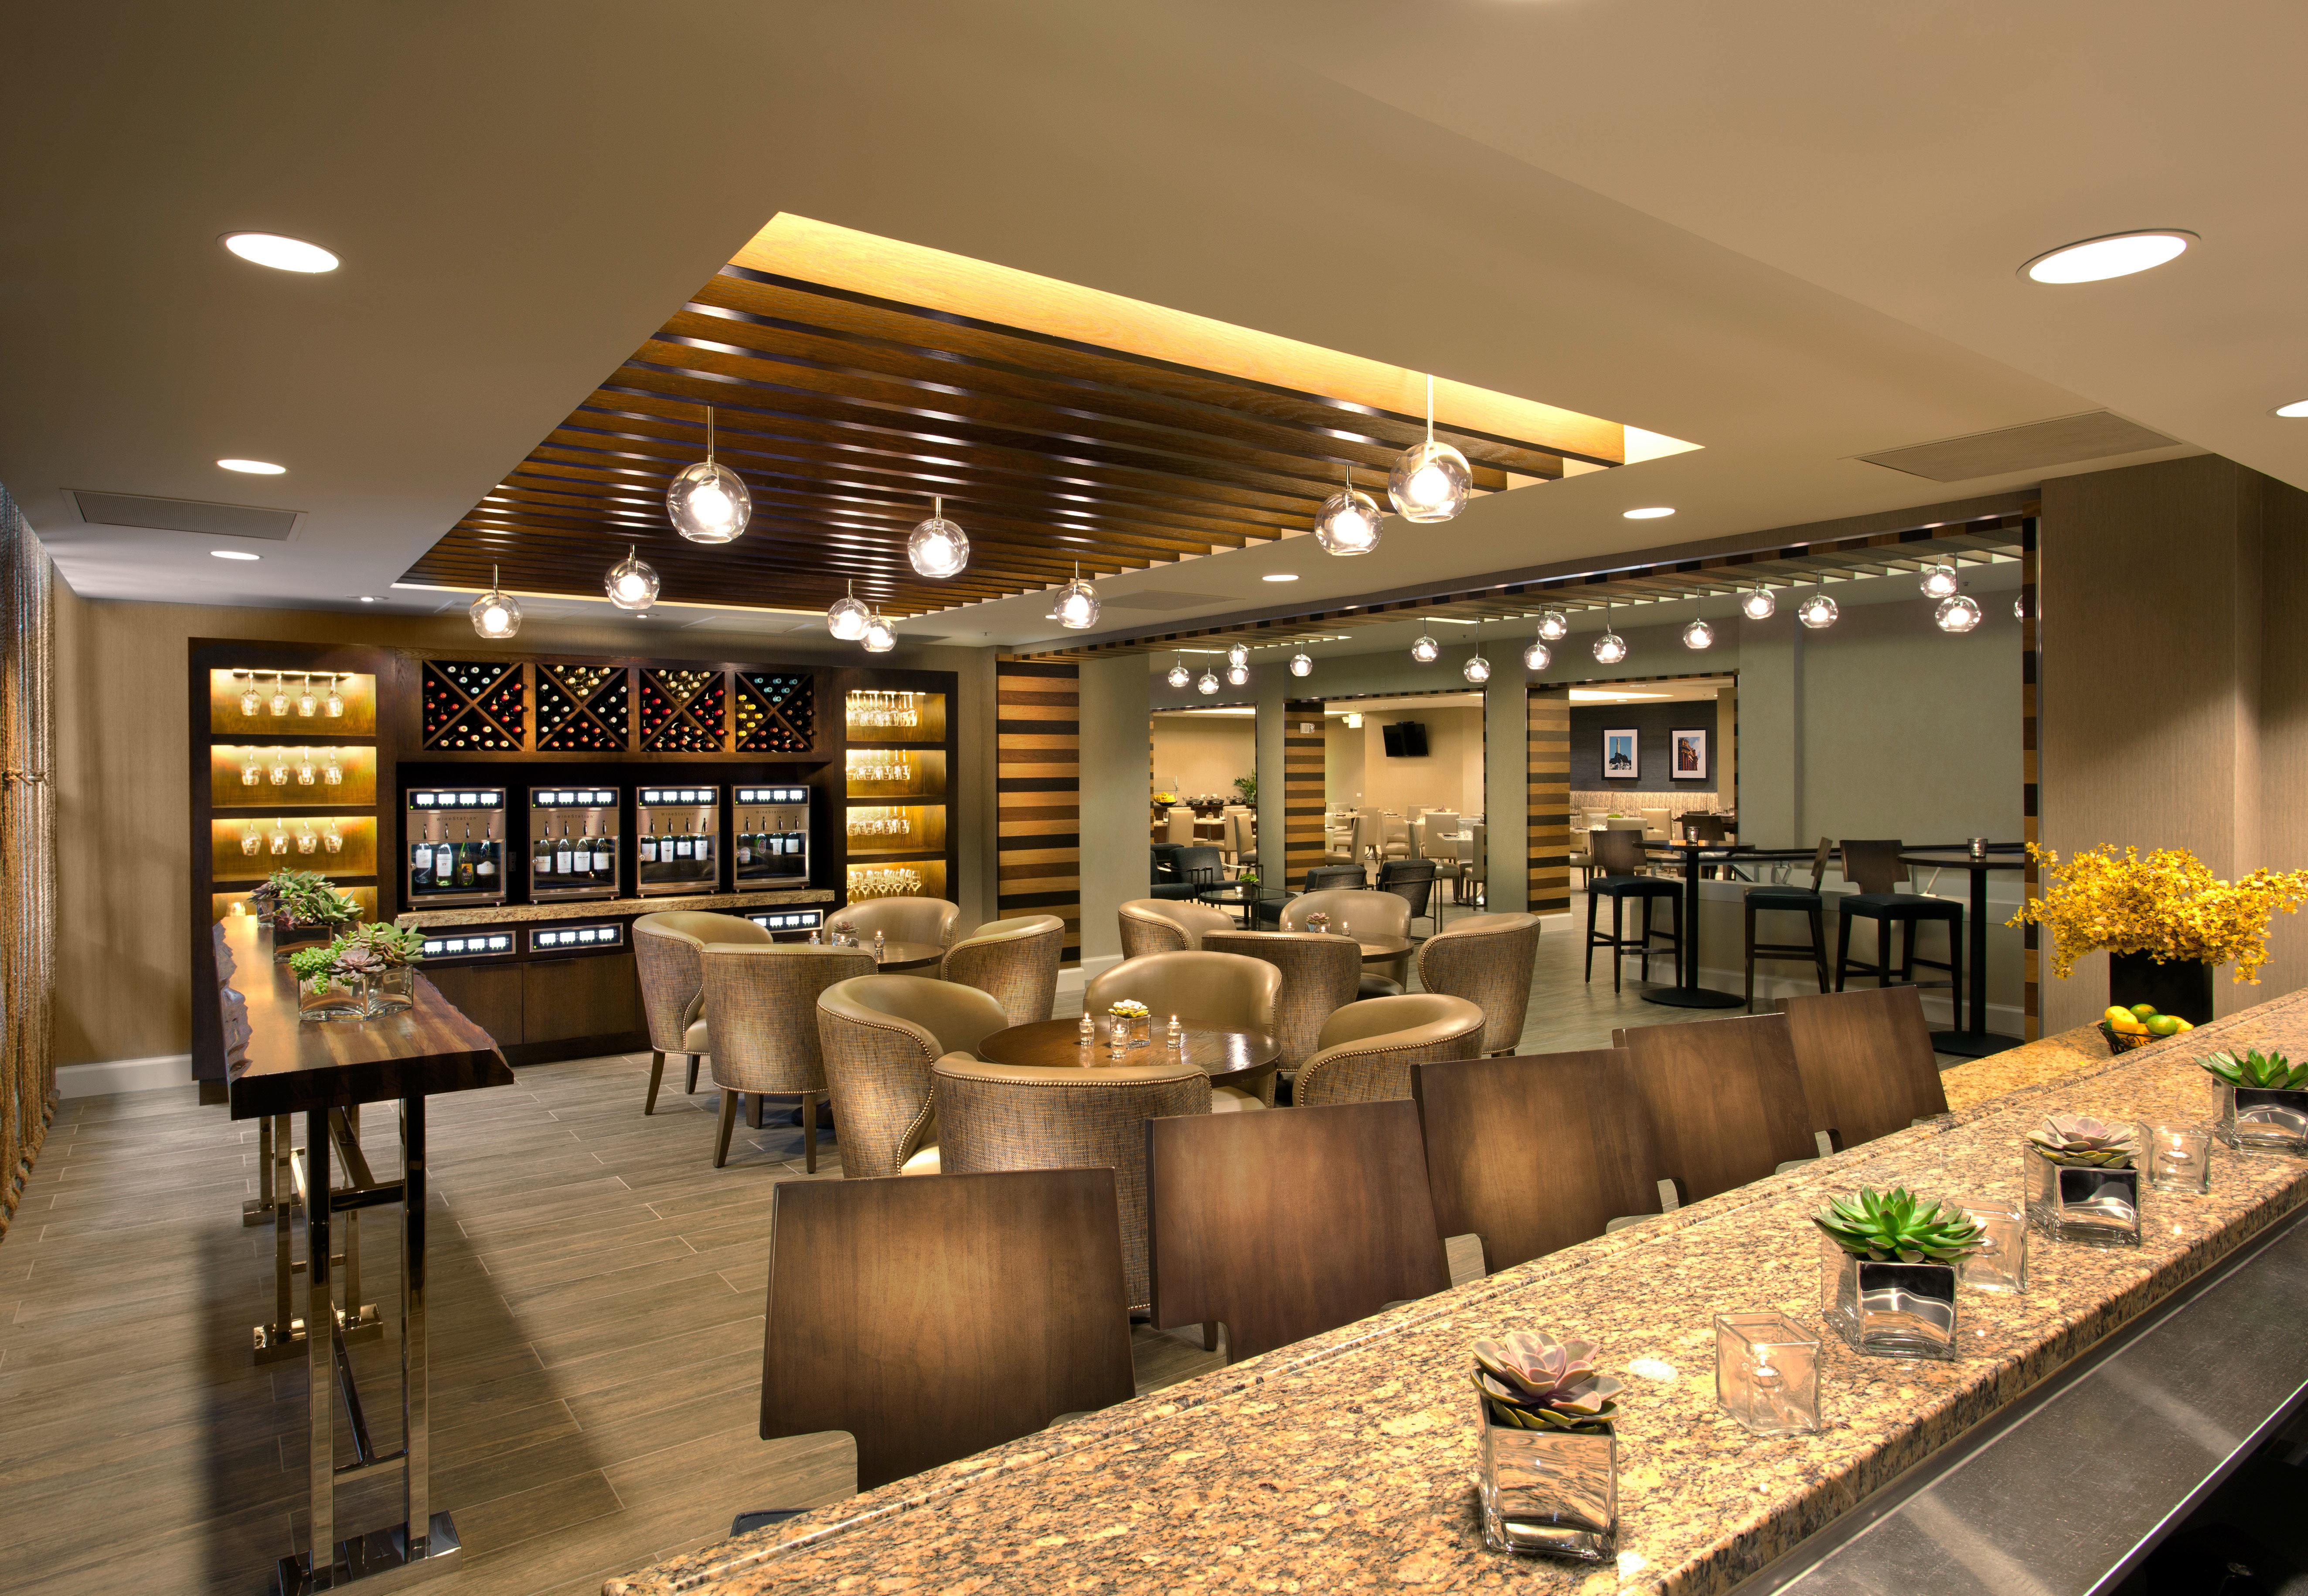 Lobby café restaurant cafeteria retail function hall food court convention center Bar fast food restaurant